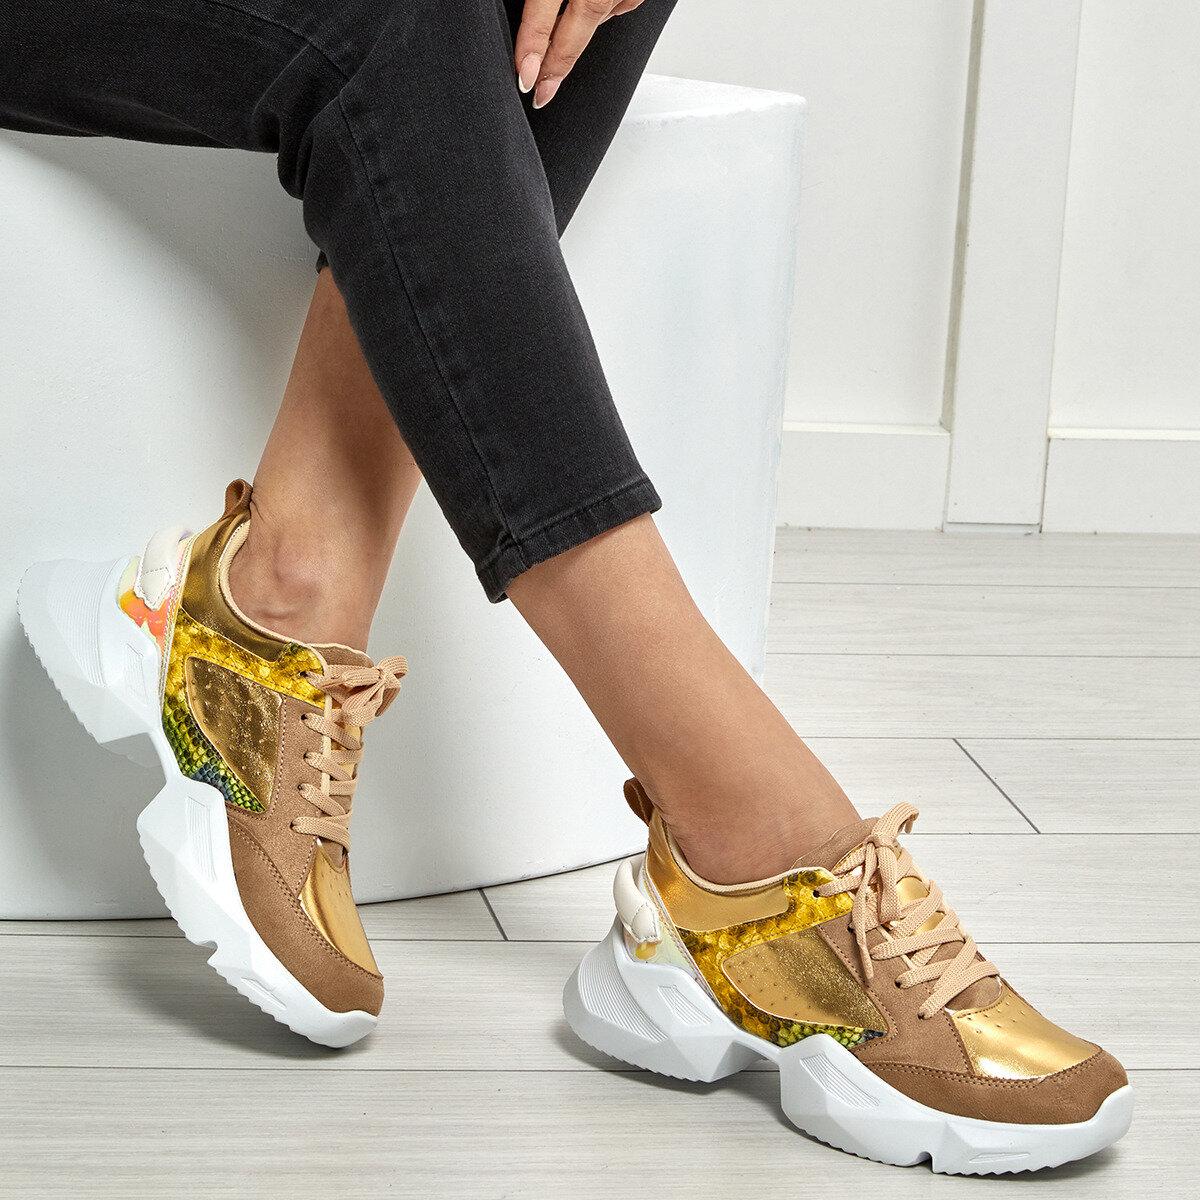 FLO Gold Women Sneaker Women Platform Chunky Sneakers Lace-up Casual Vulcanize Shoes Luxury Designer Old Dad Female Fashion Sneakers 2020 BUTIGO POLKA DOT